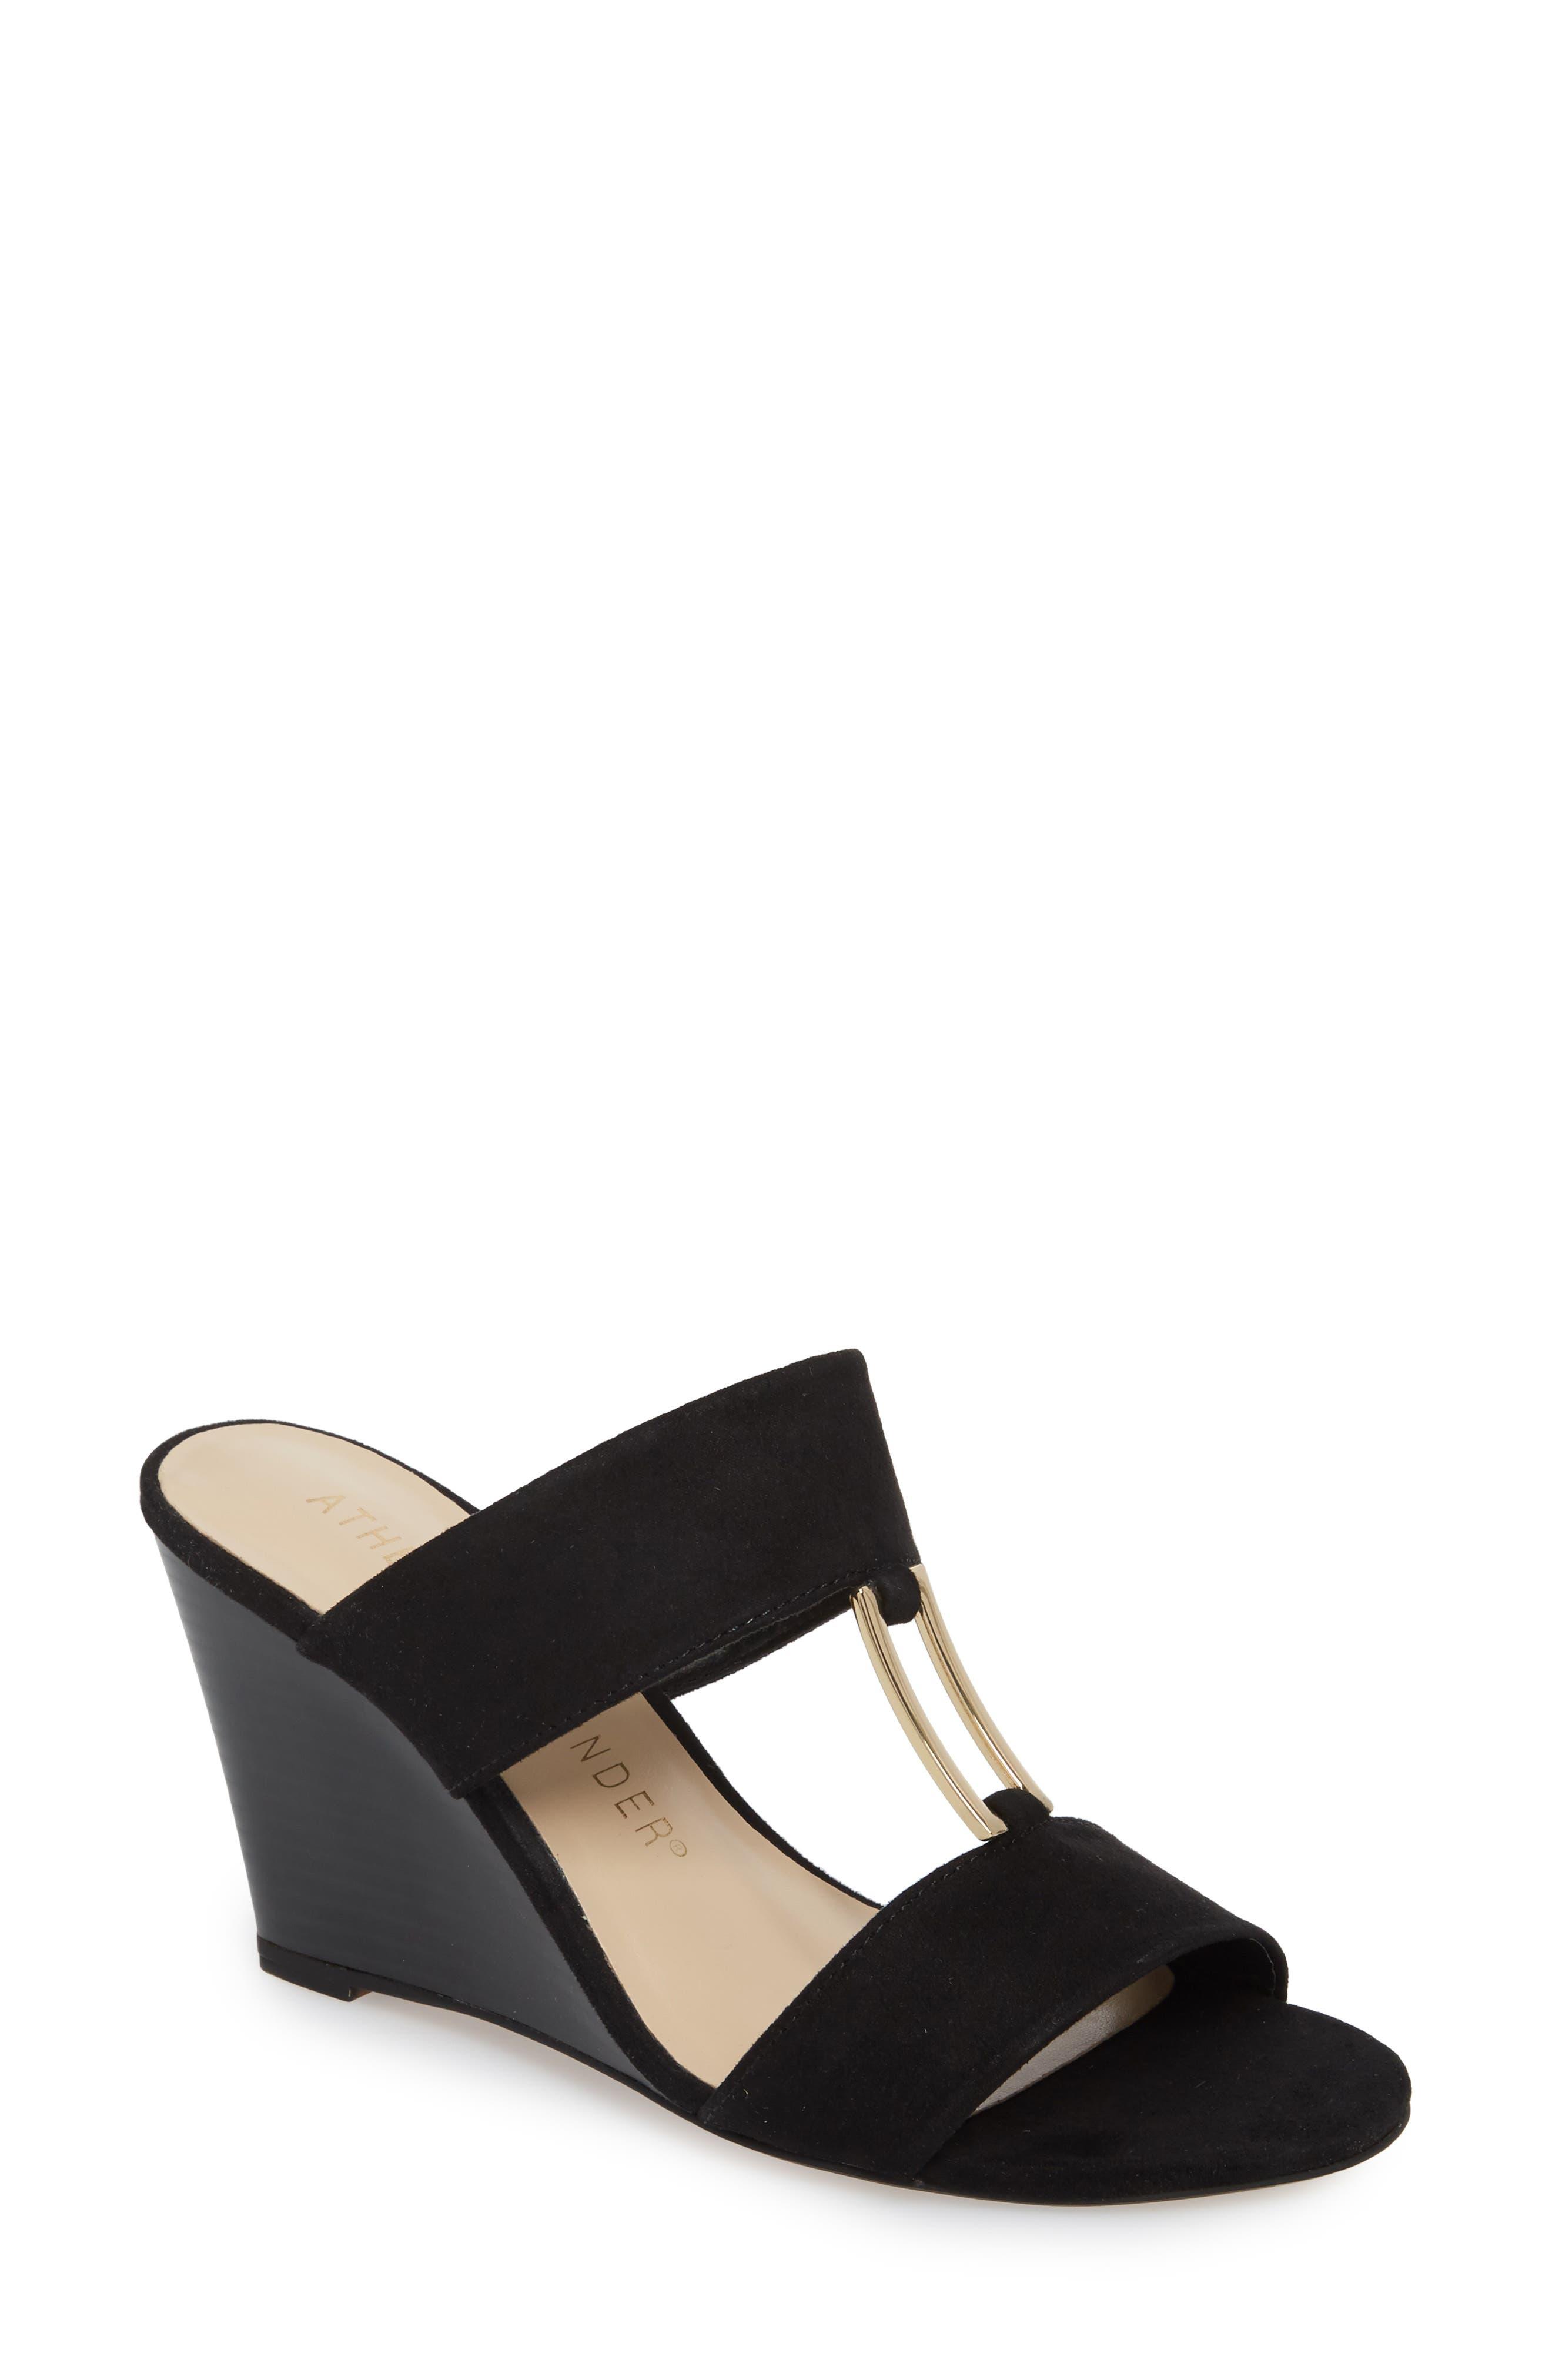 Ellis Wedge Sandal,                         Main,                         color, Black Suede